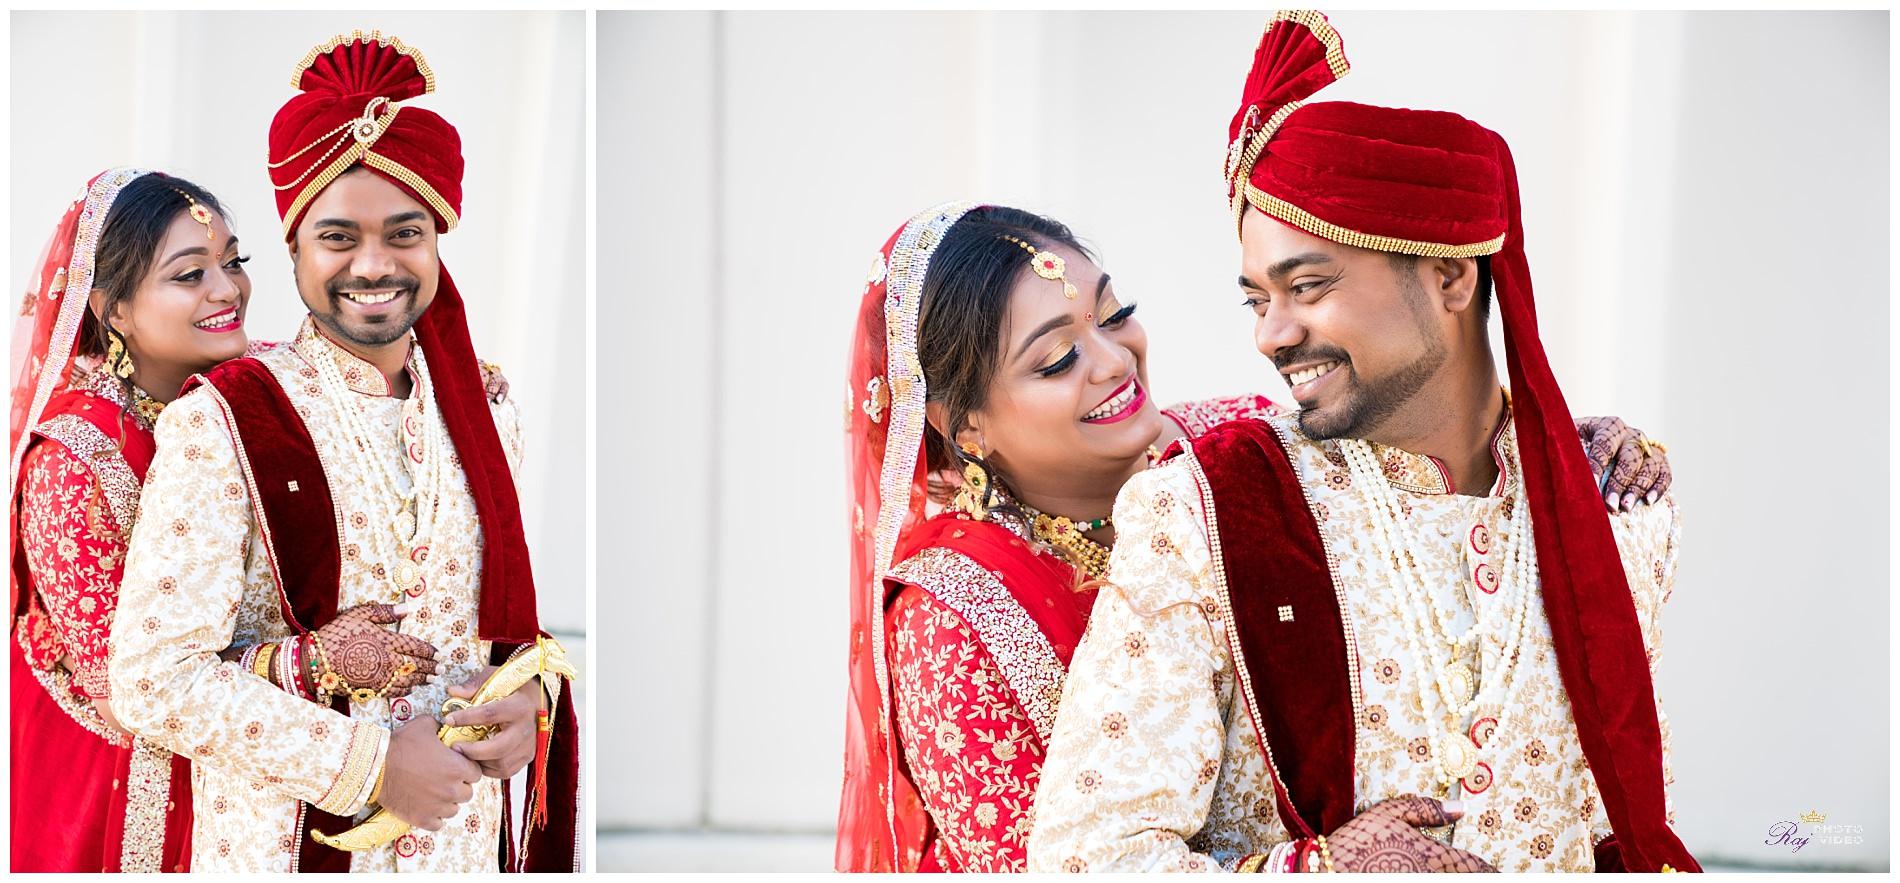 doubletree-by-hilton-hotel-wilmington-de-wedding-krishna-ritesh-30.jpg